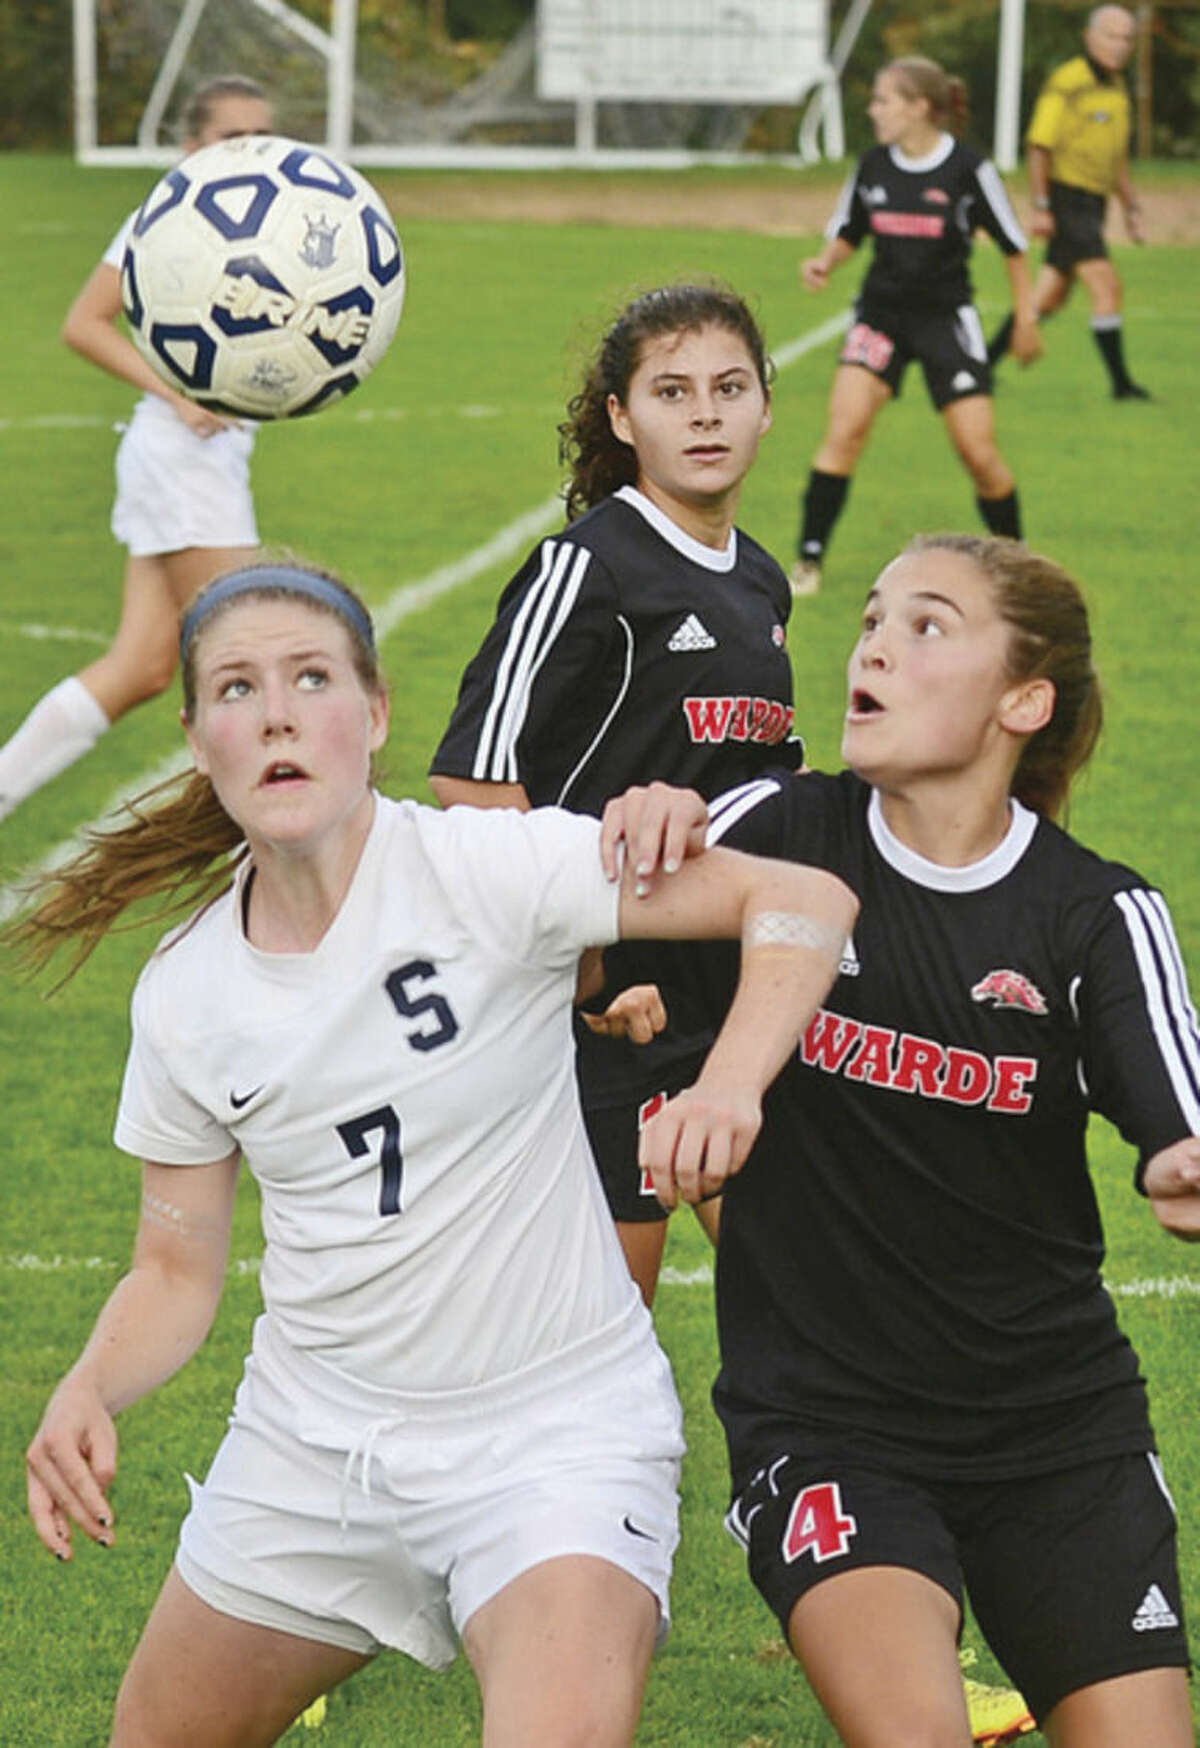 Hour photo/Erik Trautmann Staples High School's Chloe Rosenfield battles with Claire Pullen of Fairfield Warde during Tuesday's game in Westport.